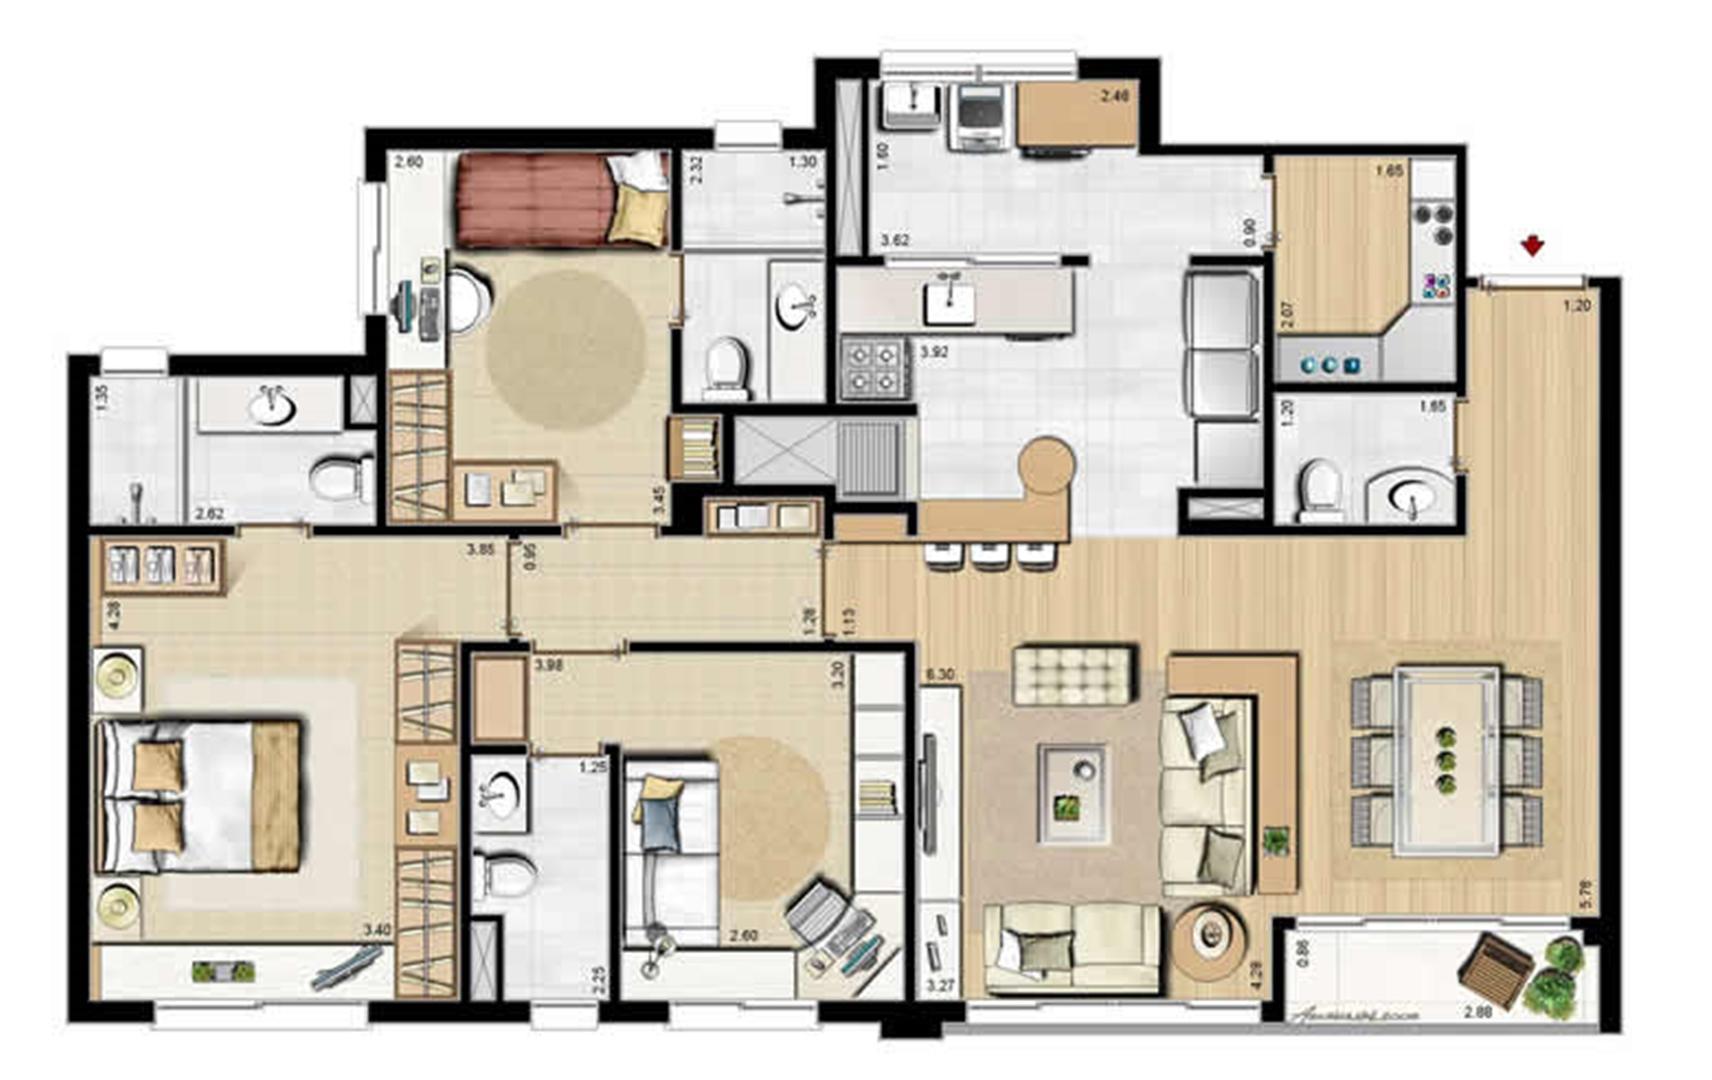 Opção 2 suítes, gabinete e despensa - 113 m² privativos e 175 m² área total | Villa Mimosa Vita Insolaratta – Apartamento no  Centro - Canoas - Rio Grande do Sul